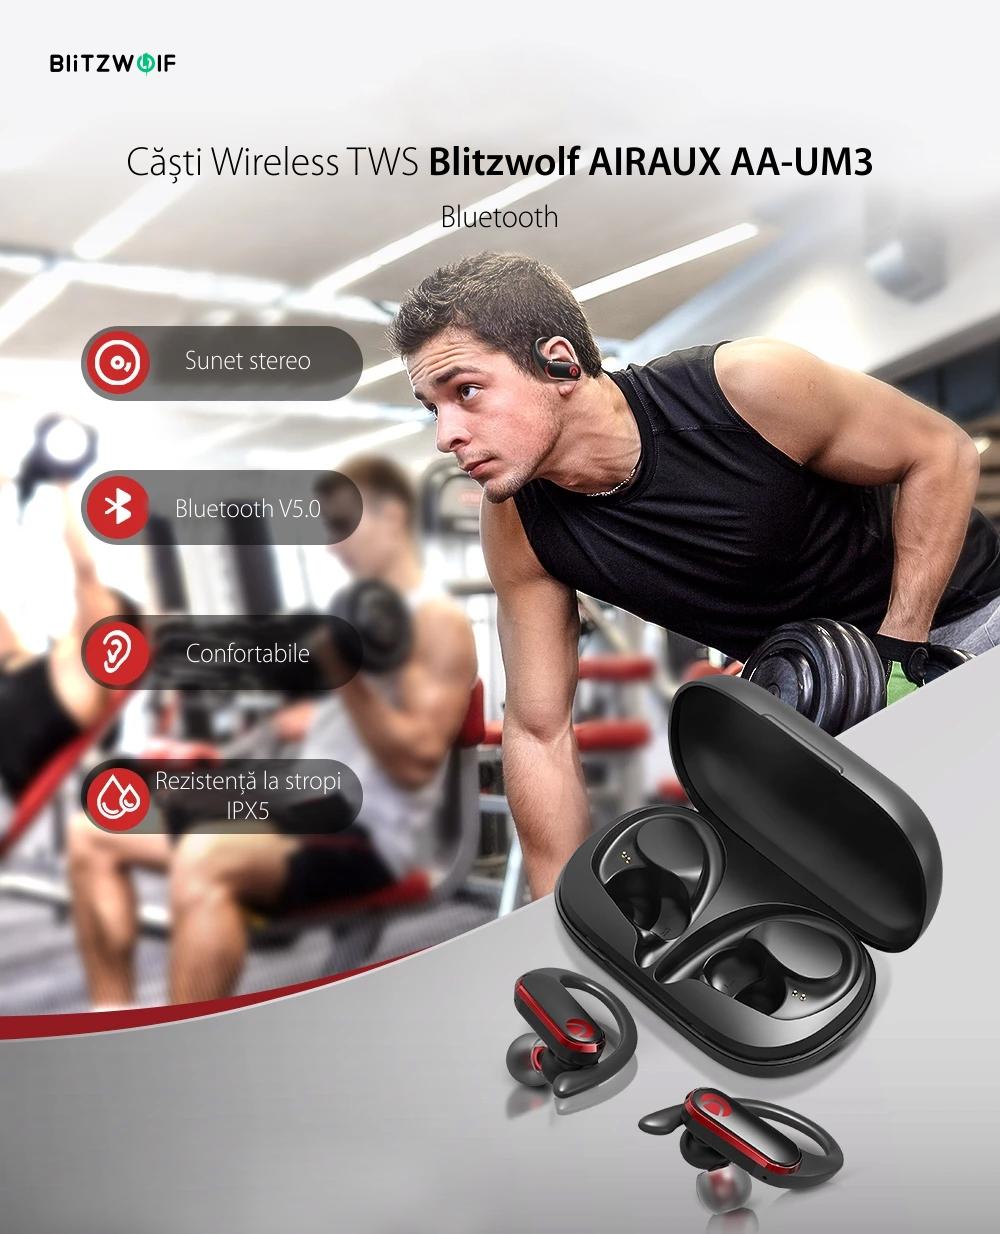 Casti in-Ear BlitzWolf AIRAUX AA-UM3, TWS, Wireless, Bluetooth 5.0, Baterie 500 mAh